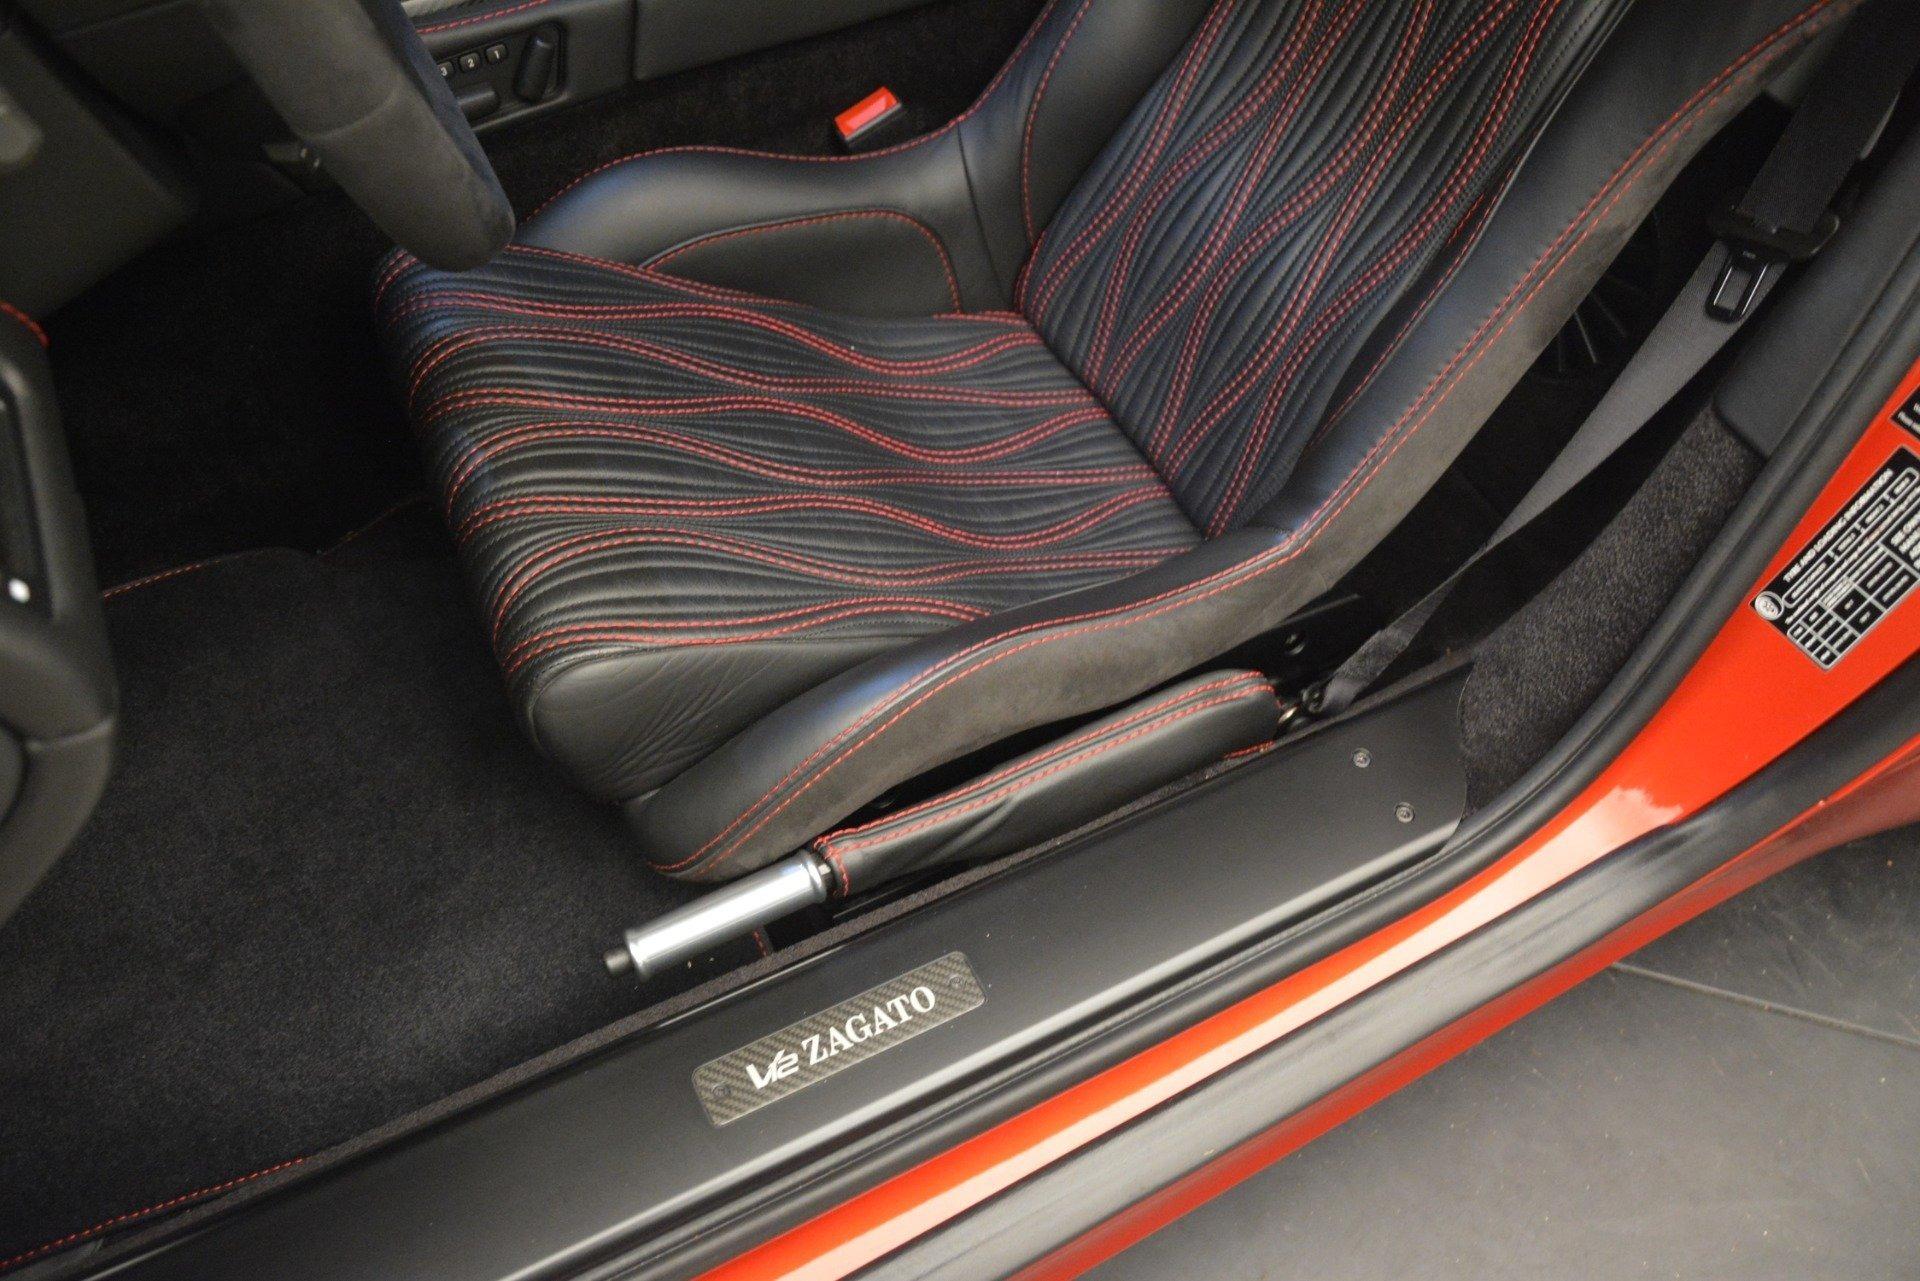 Used 2013 Aston Martin V12 Zagato Coupe For Sale In Westport, CT 3181_p14